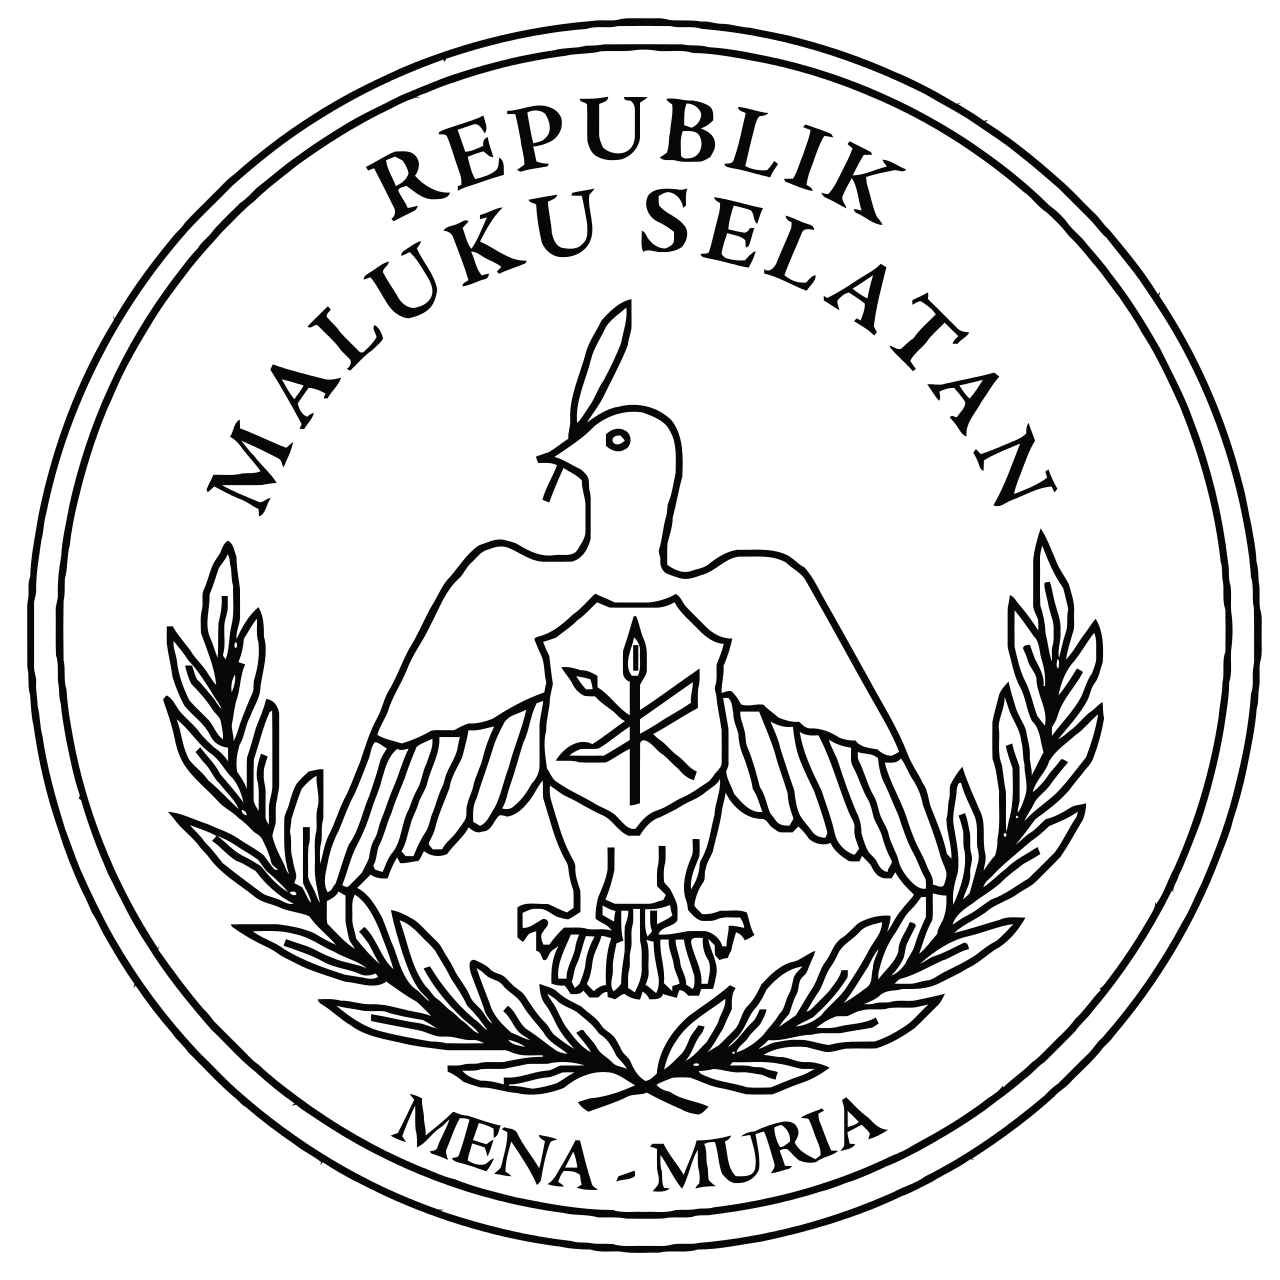 Seal Of The Republik Maluku Selatan Molukken Symbolen Cultuur